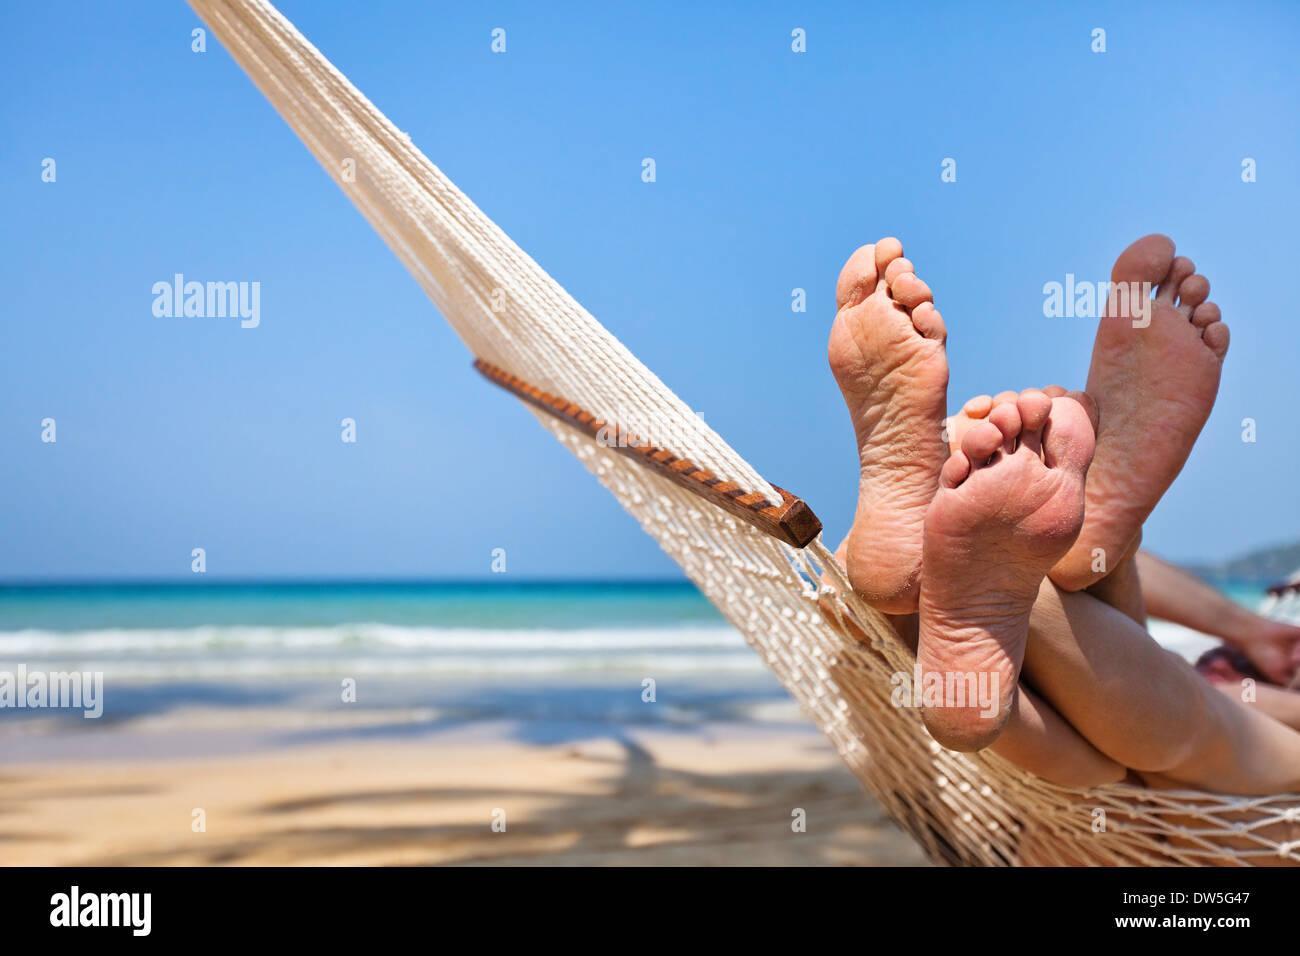 couple in hammock on the beach - Stock Image